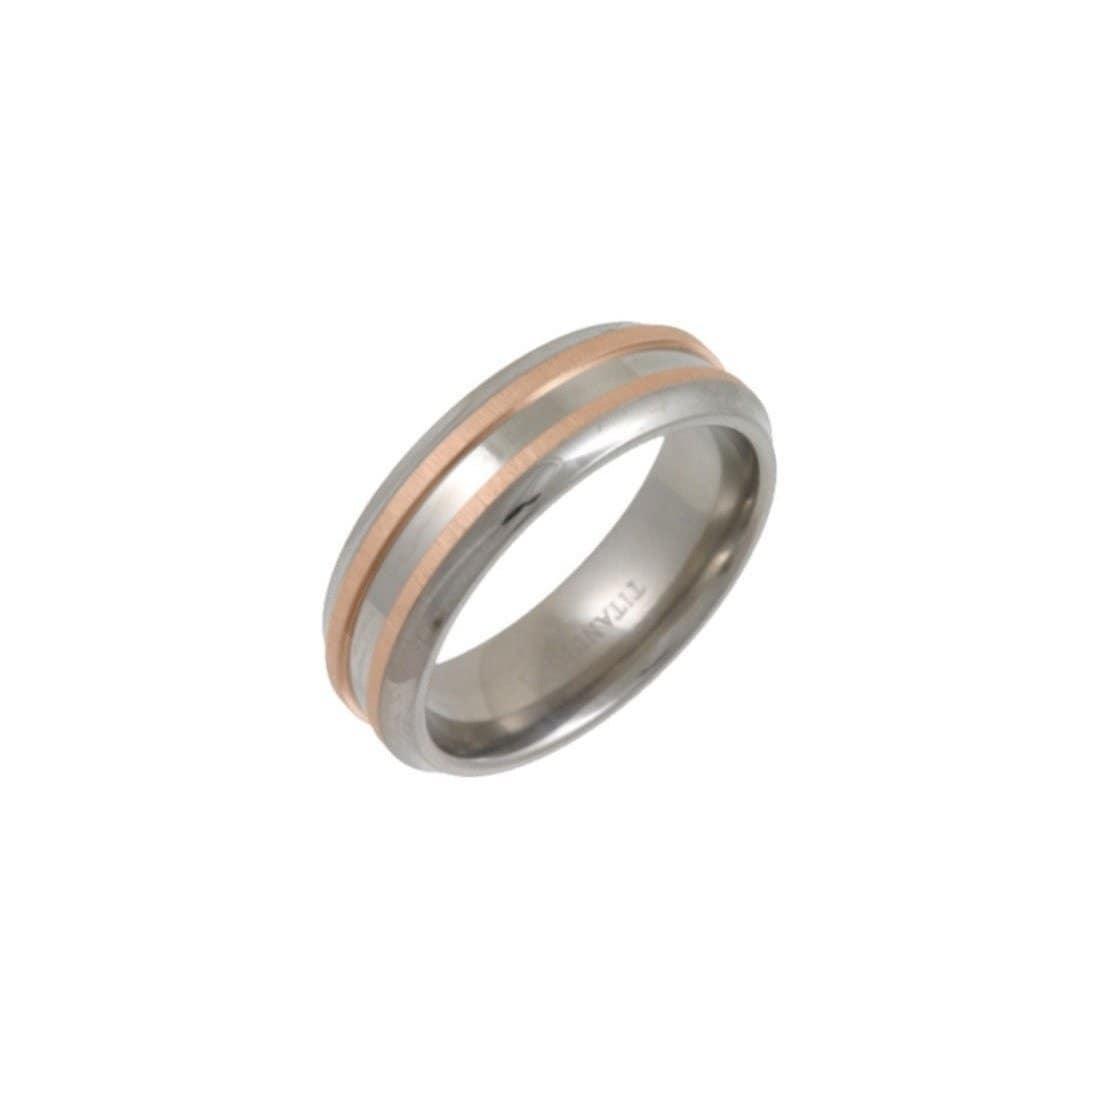 Titanium & 9kt Rose Gold Inlay 7mm Wedding Ring